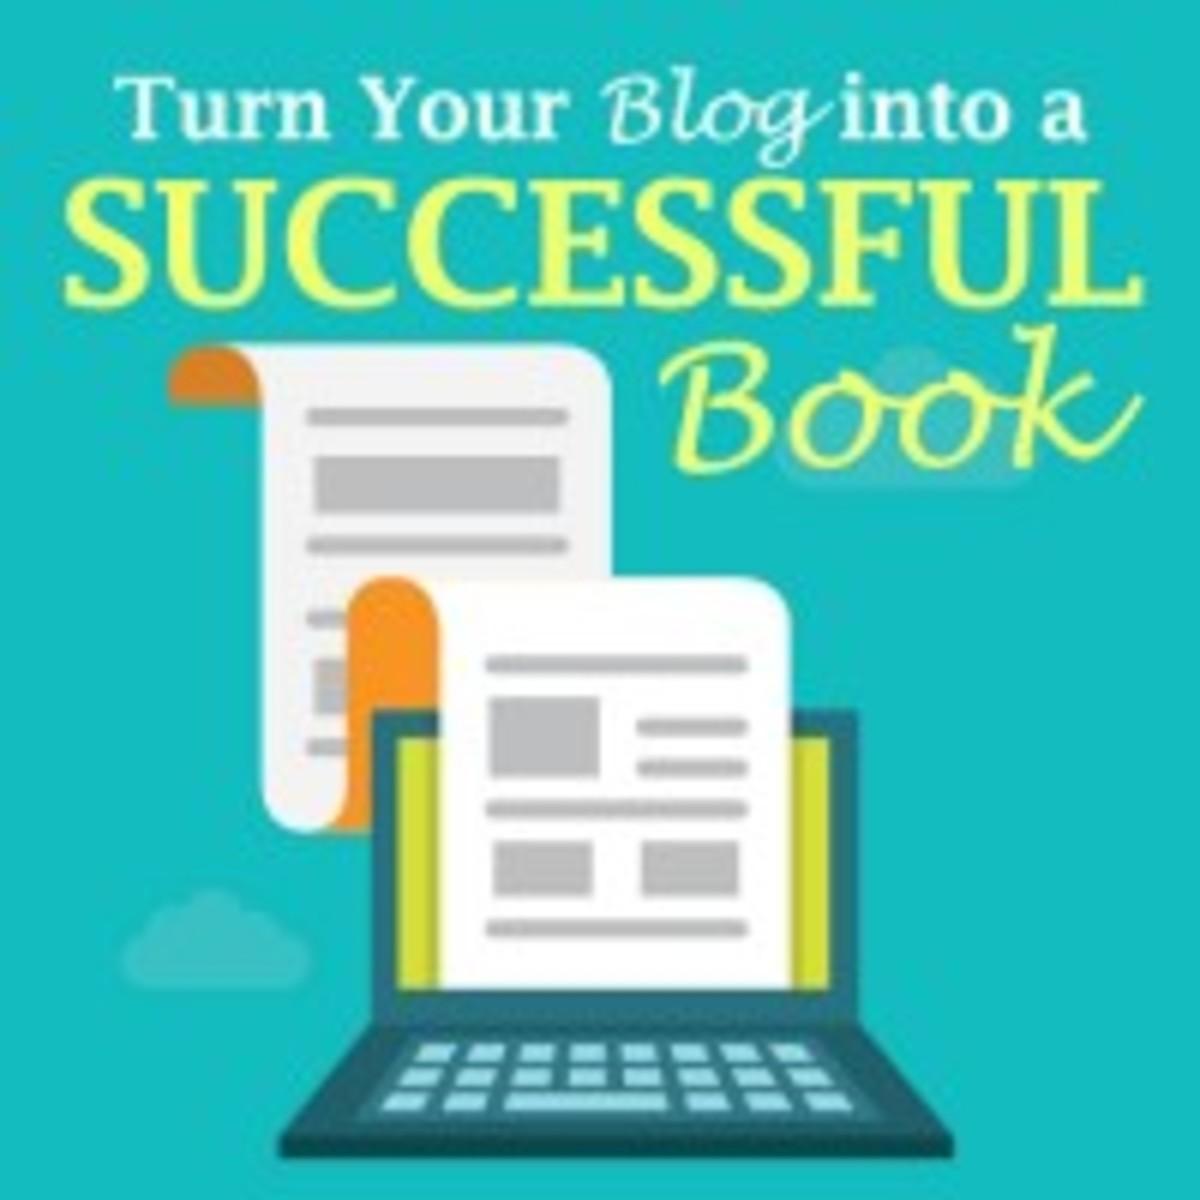 wd_blogbook-500